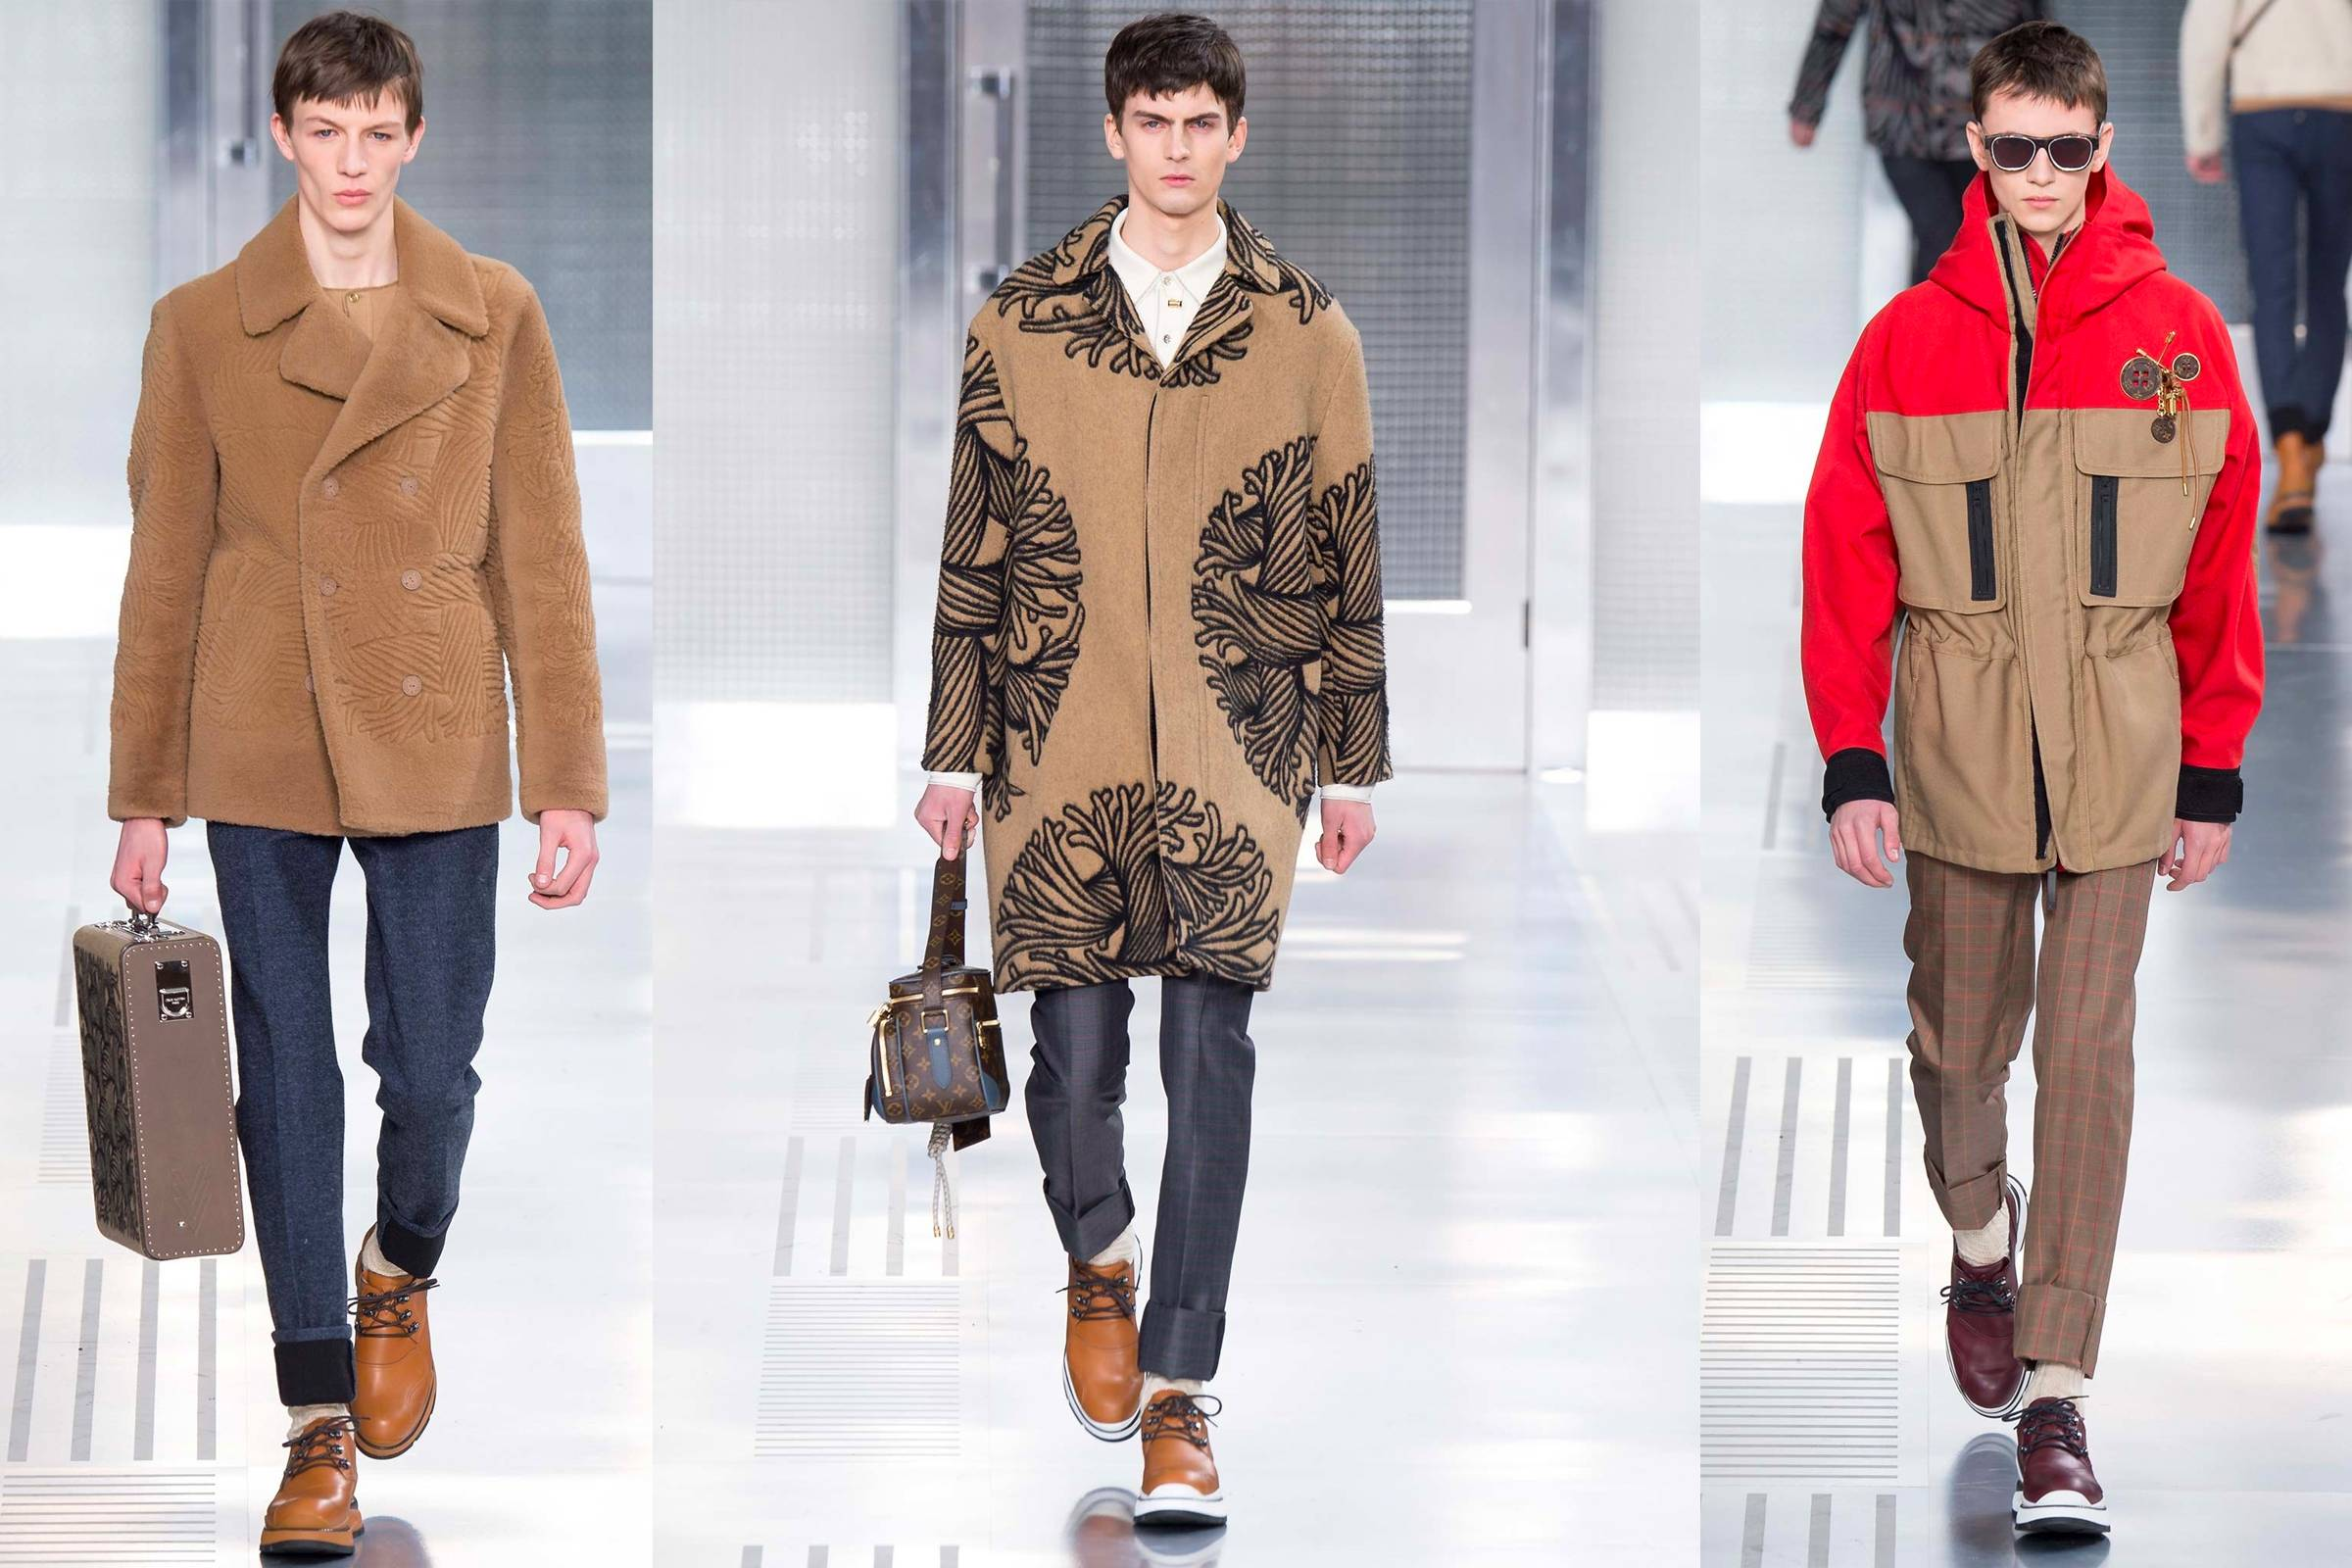 Louis Vuitton Fall/Winter 2015